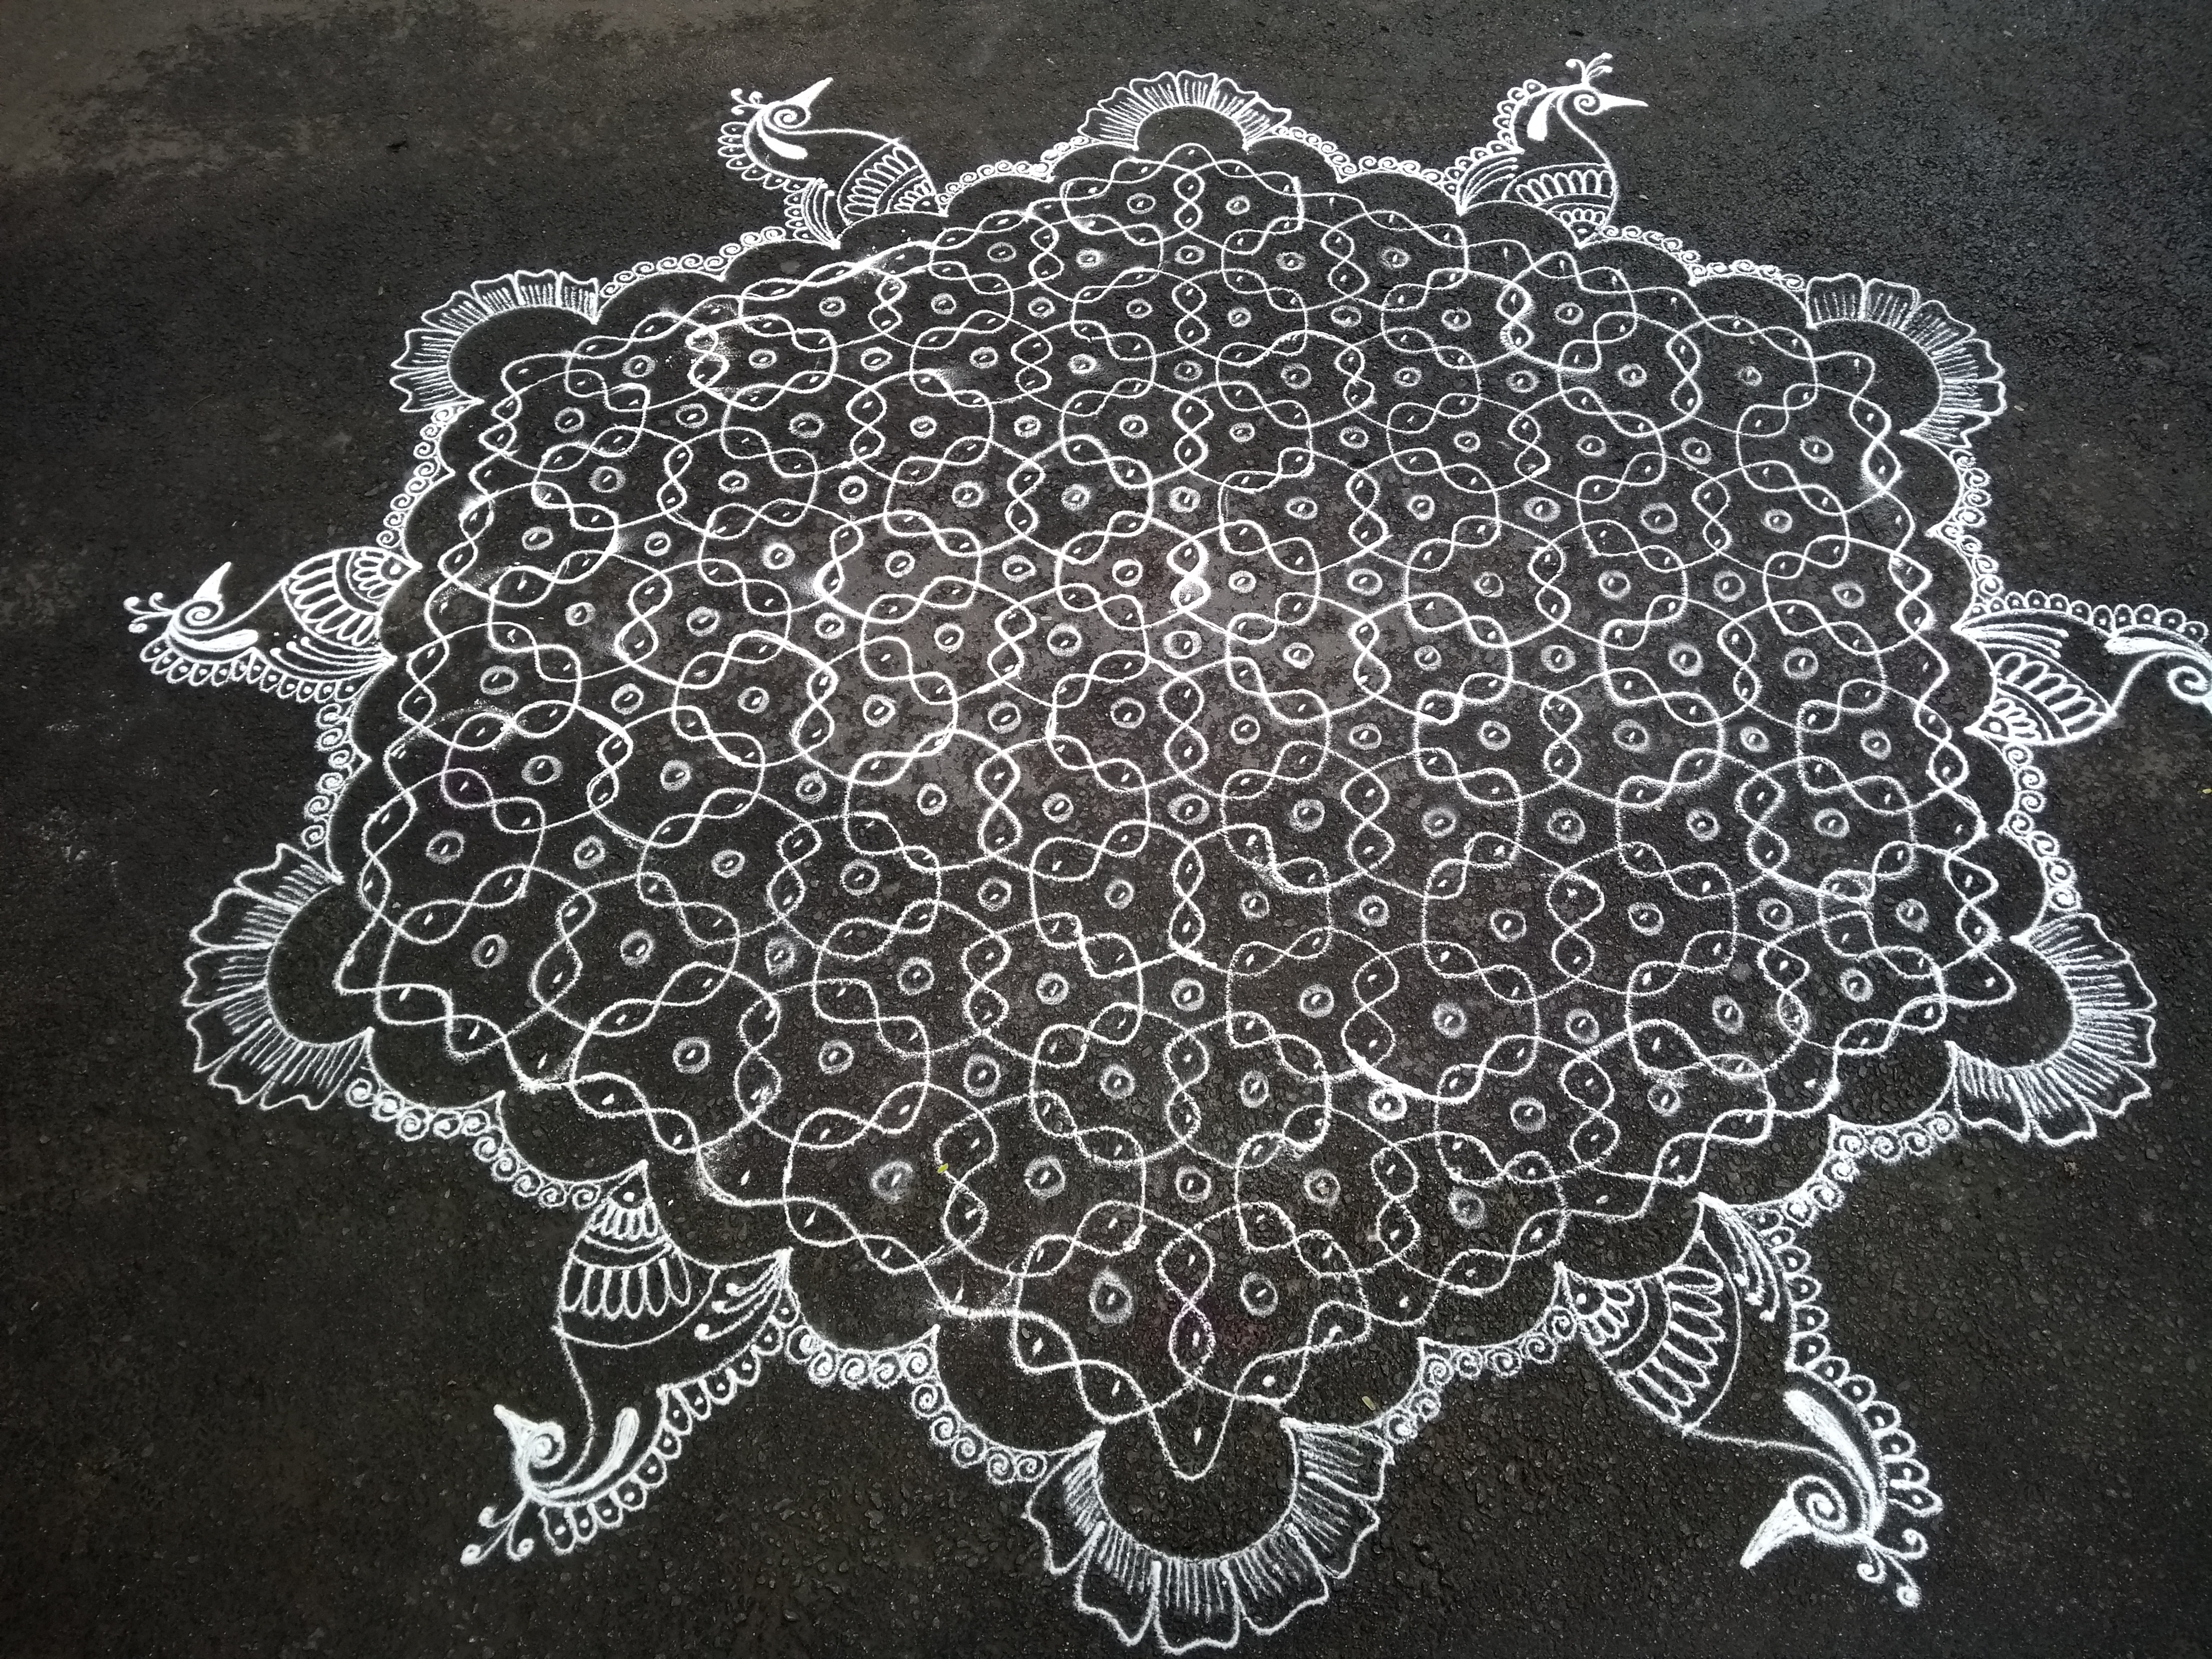 25 dots Sikku Kolam for Contest || 6 mughanukku 6 mayilvaaghanangal